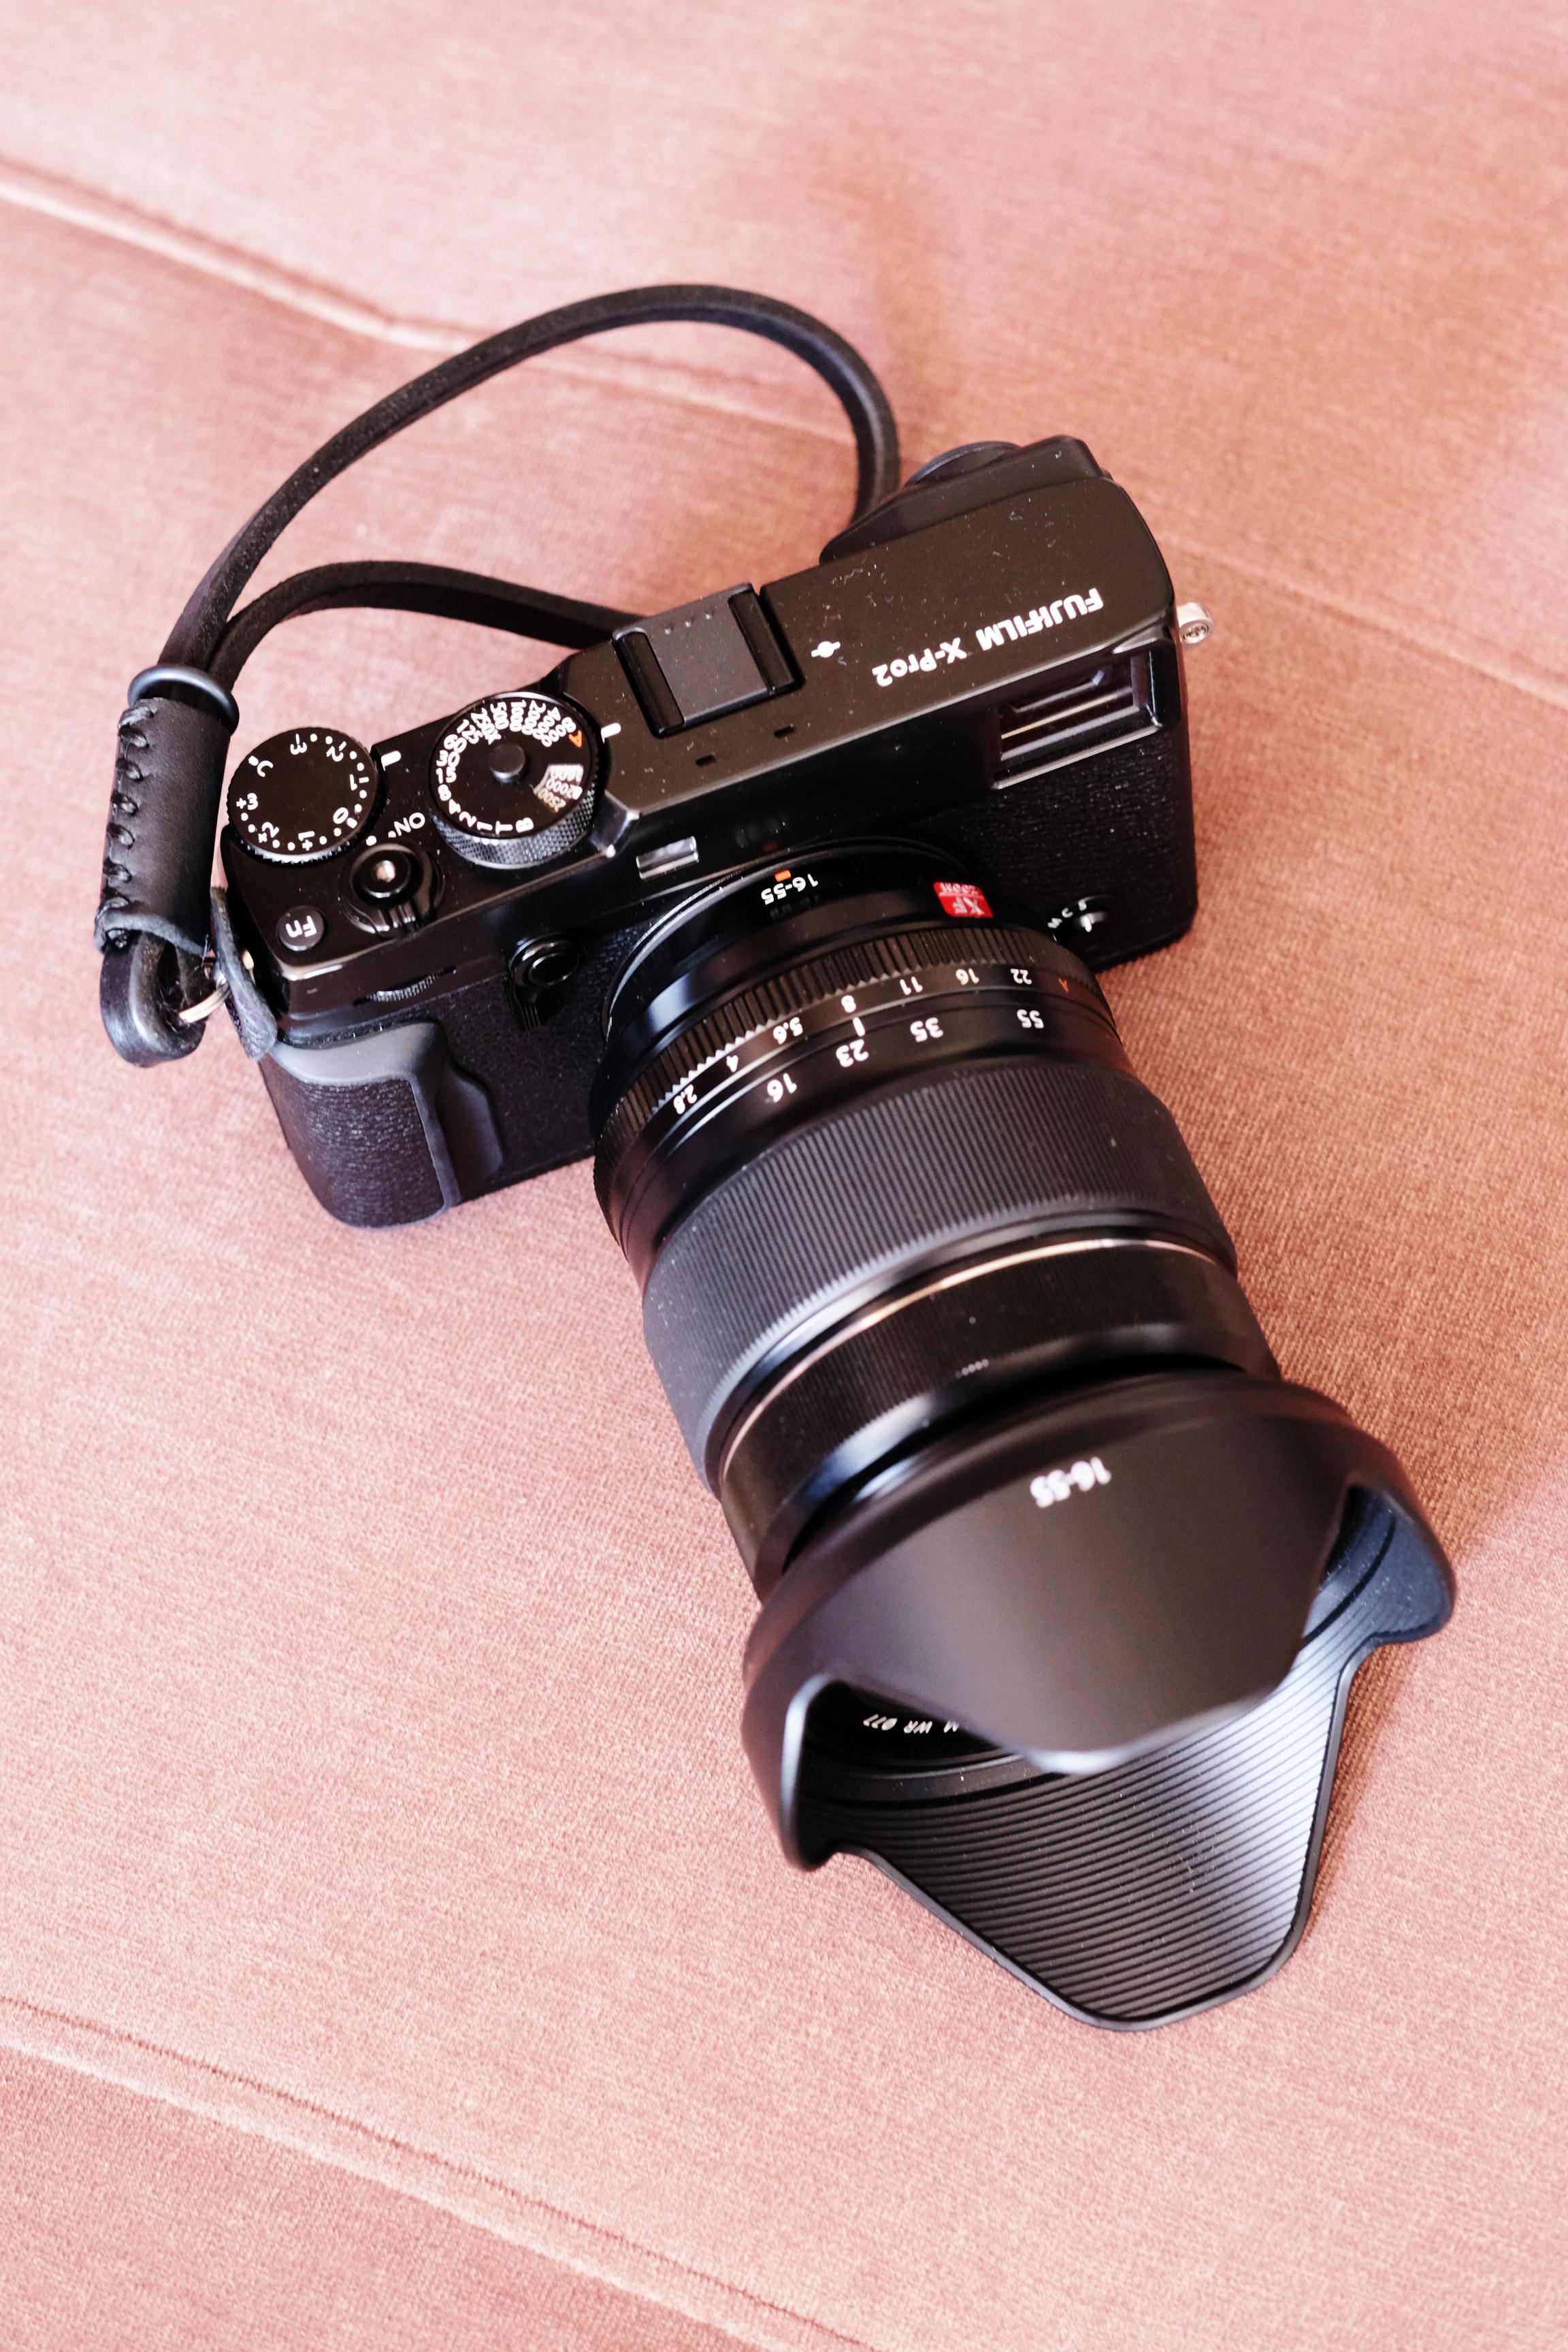 xpro2 16-55mm 1